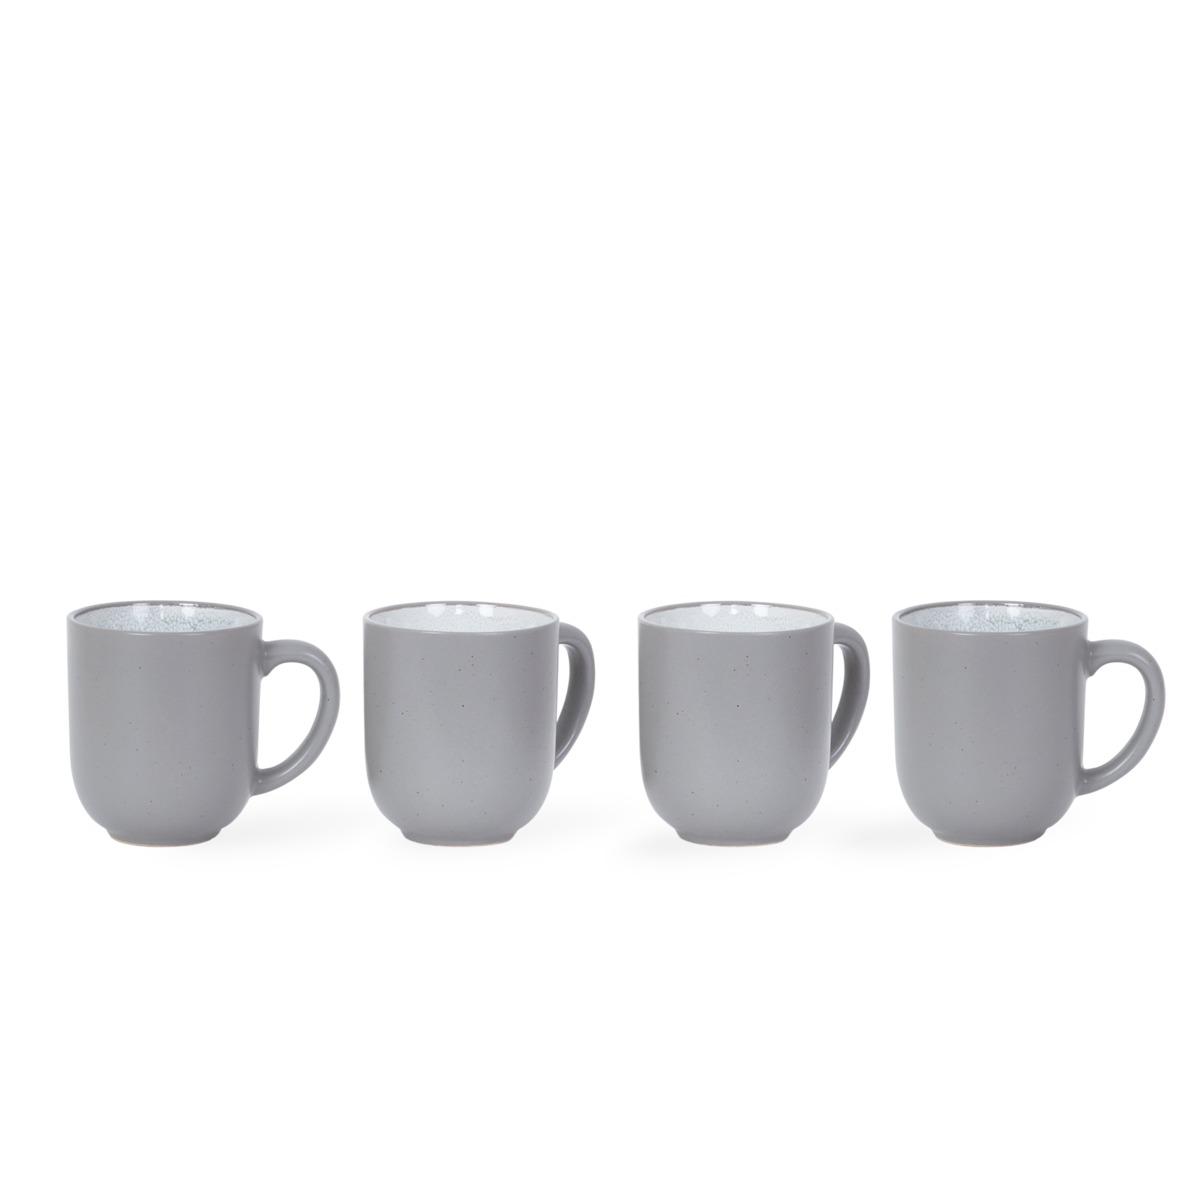 Aiko 4-Piece Mug Set